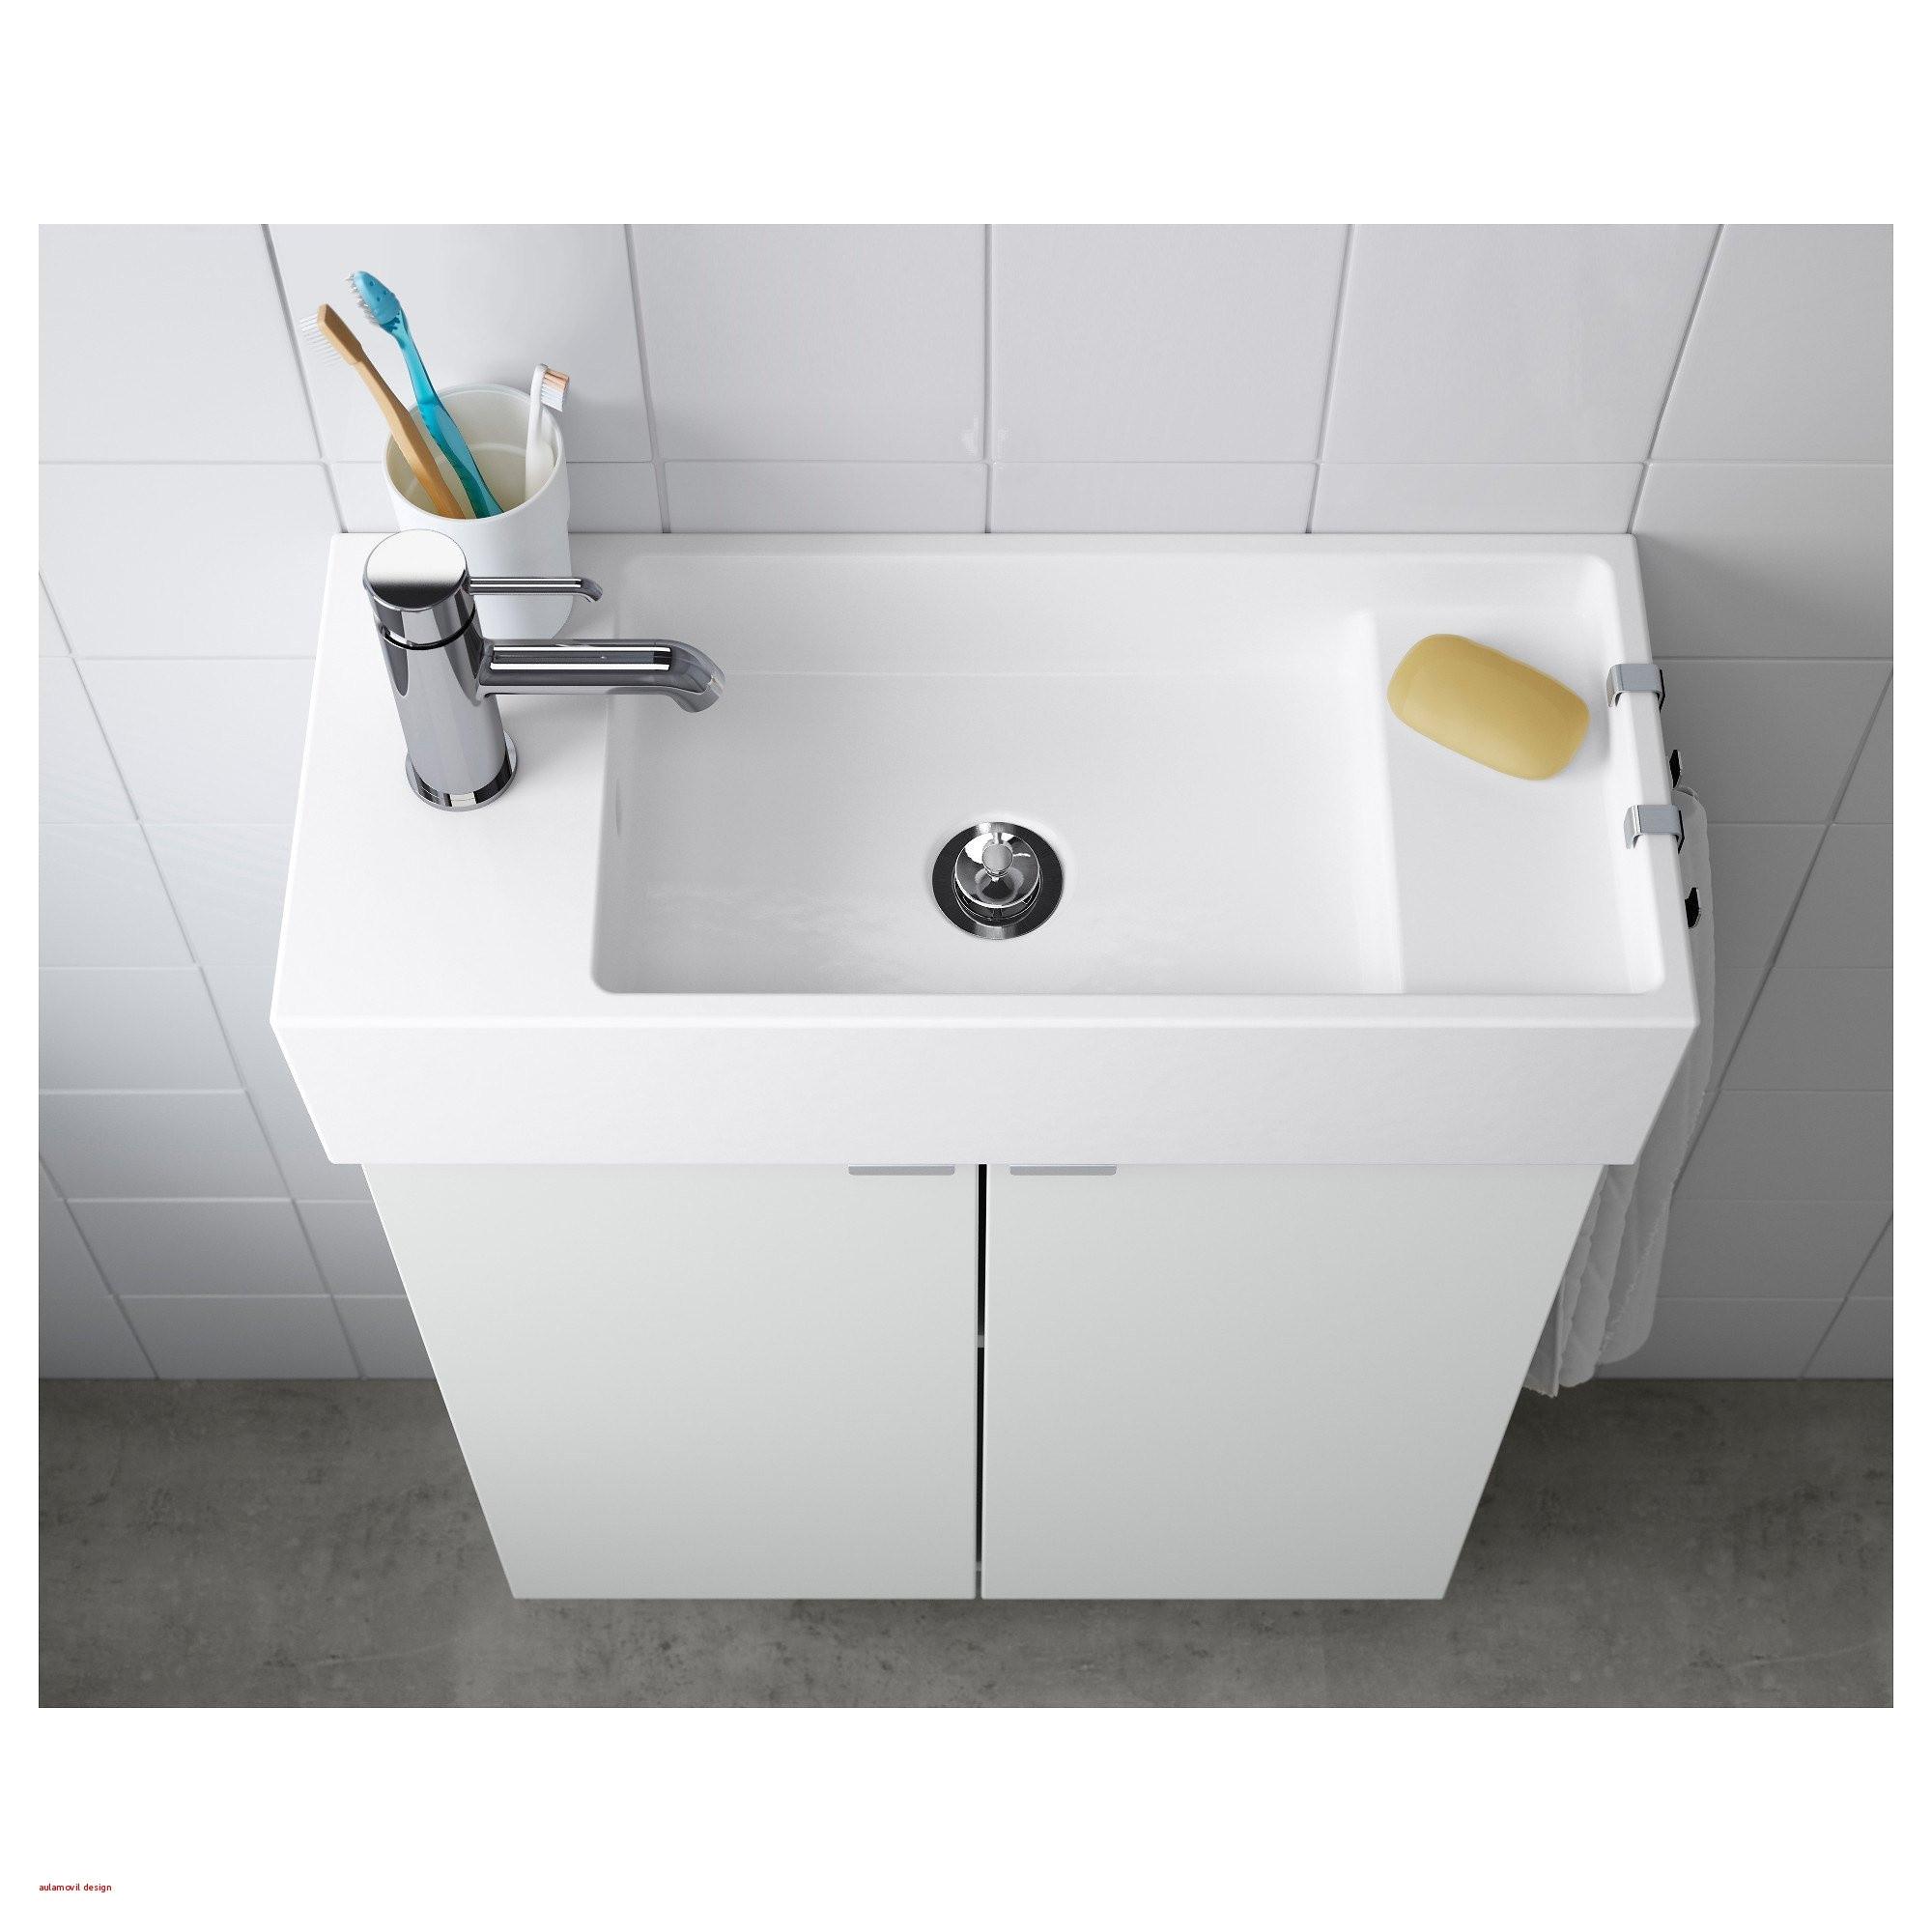 small bathtubs for small bathrooms small bathroom interior design new pe s5h sink ikea small i